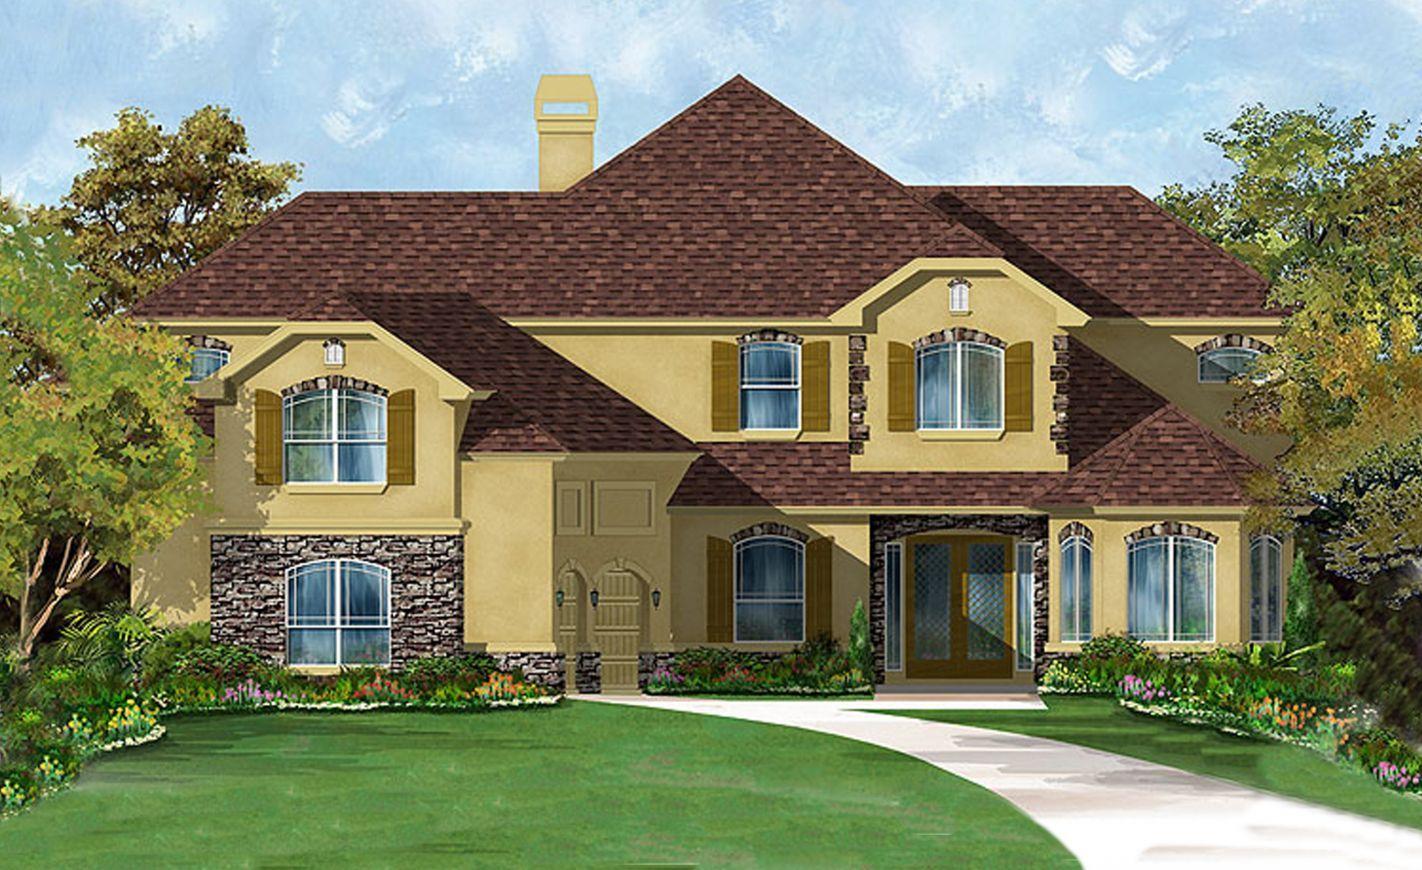 Single Family for Sale at Tamaya - Nottingham Ii 2938 Danube Court Jacksonville, Florida 32246 United States